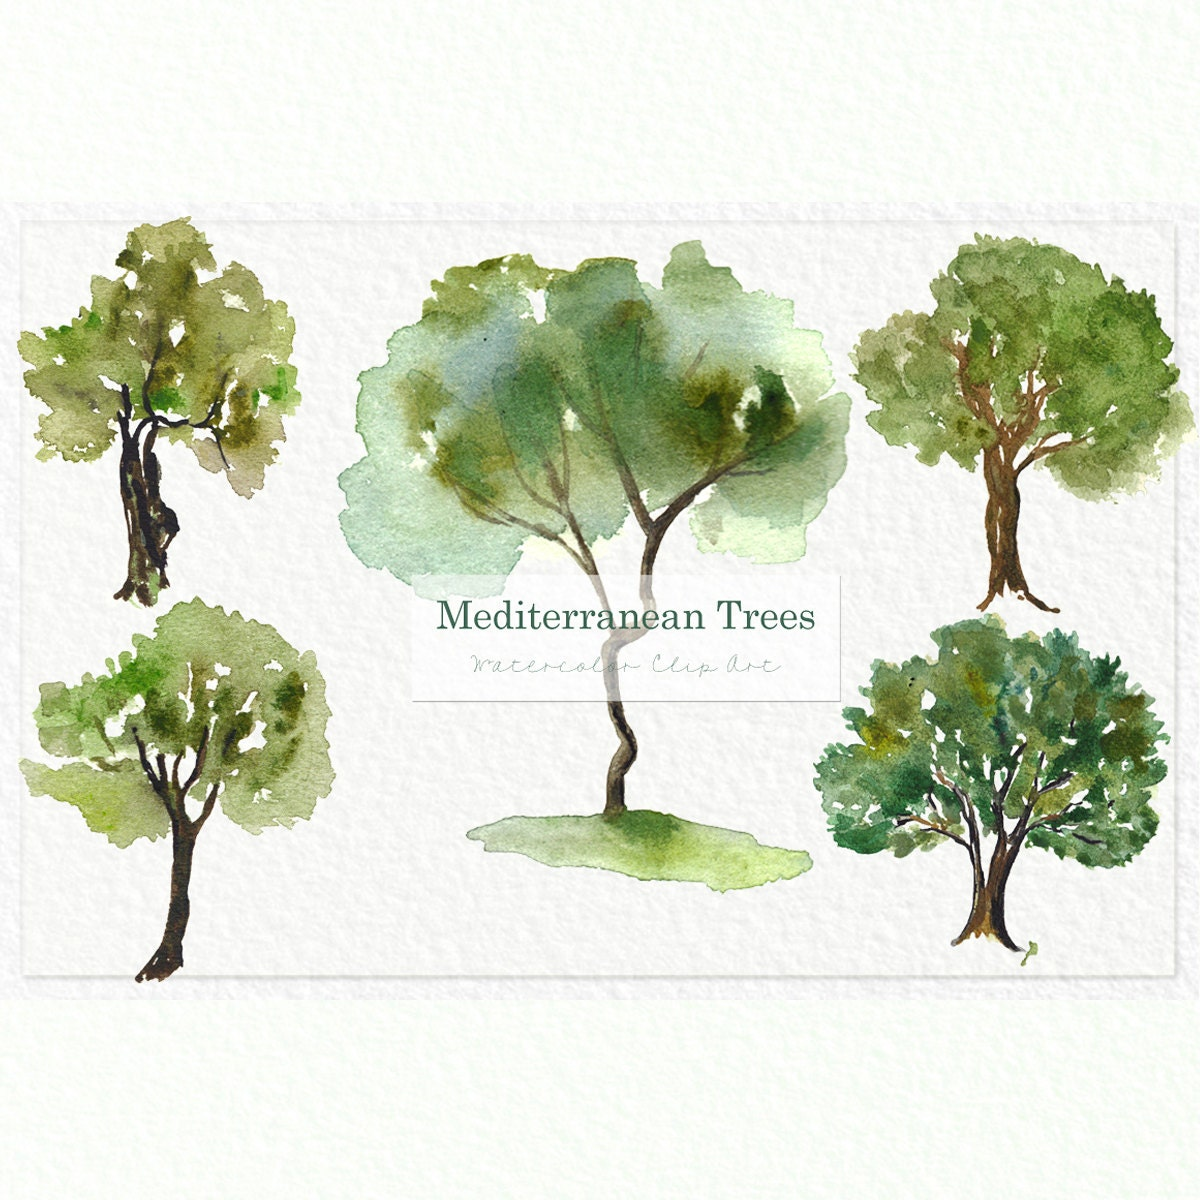 Wedding Tree Watercolor Clipart: Mediterranean TREES. Watercolor Clip Art. Digital